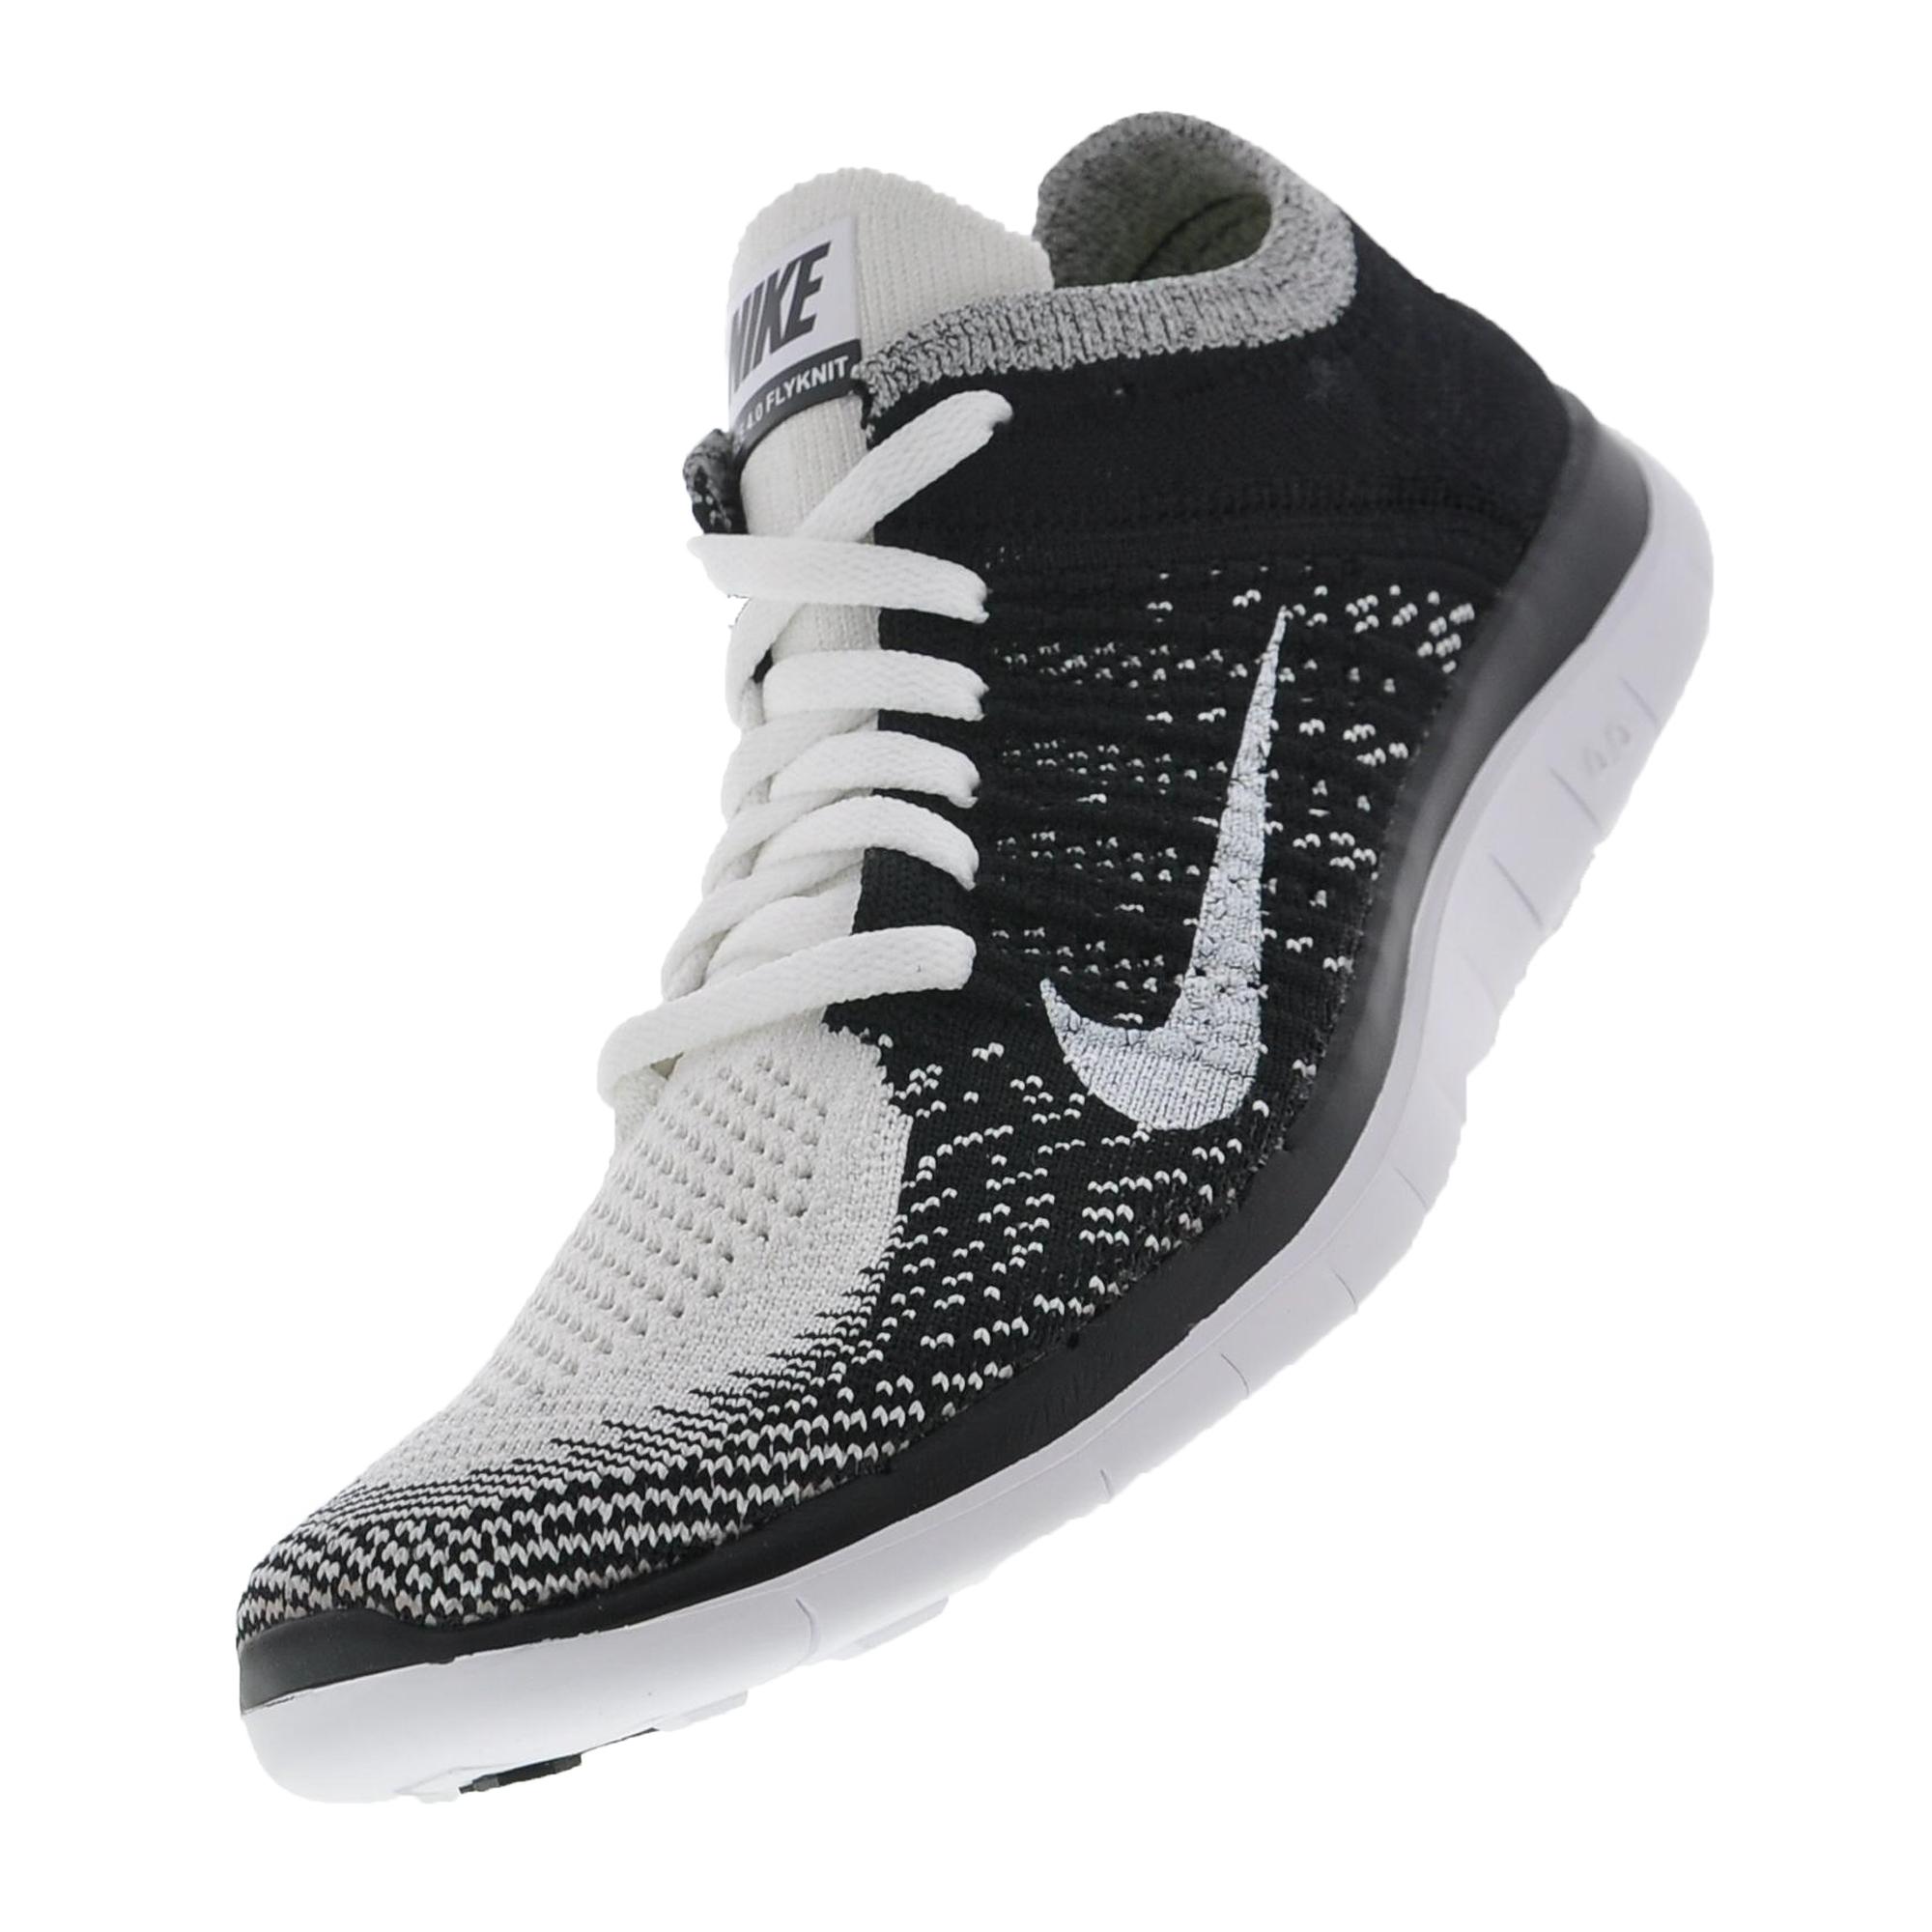 vente chaude en ligne 97542 b77ce Nike Free 4.0 Flyknit Kadın Spor Ayakkabı